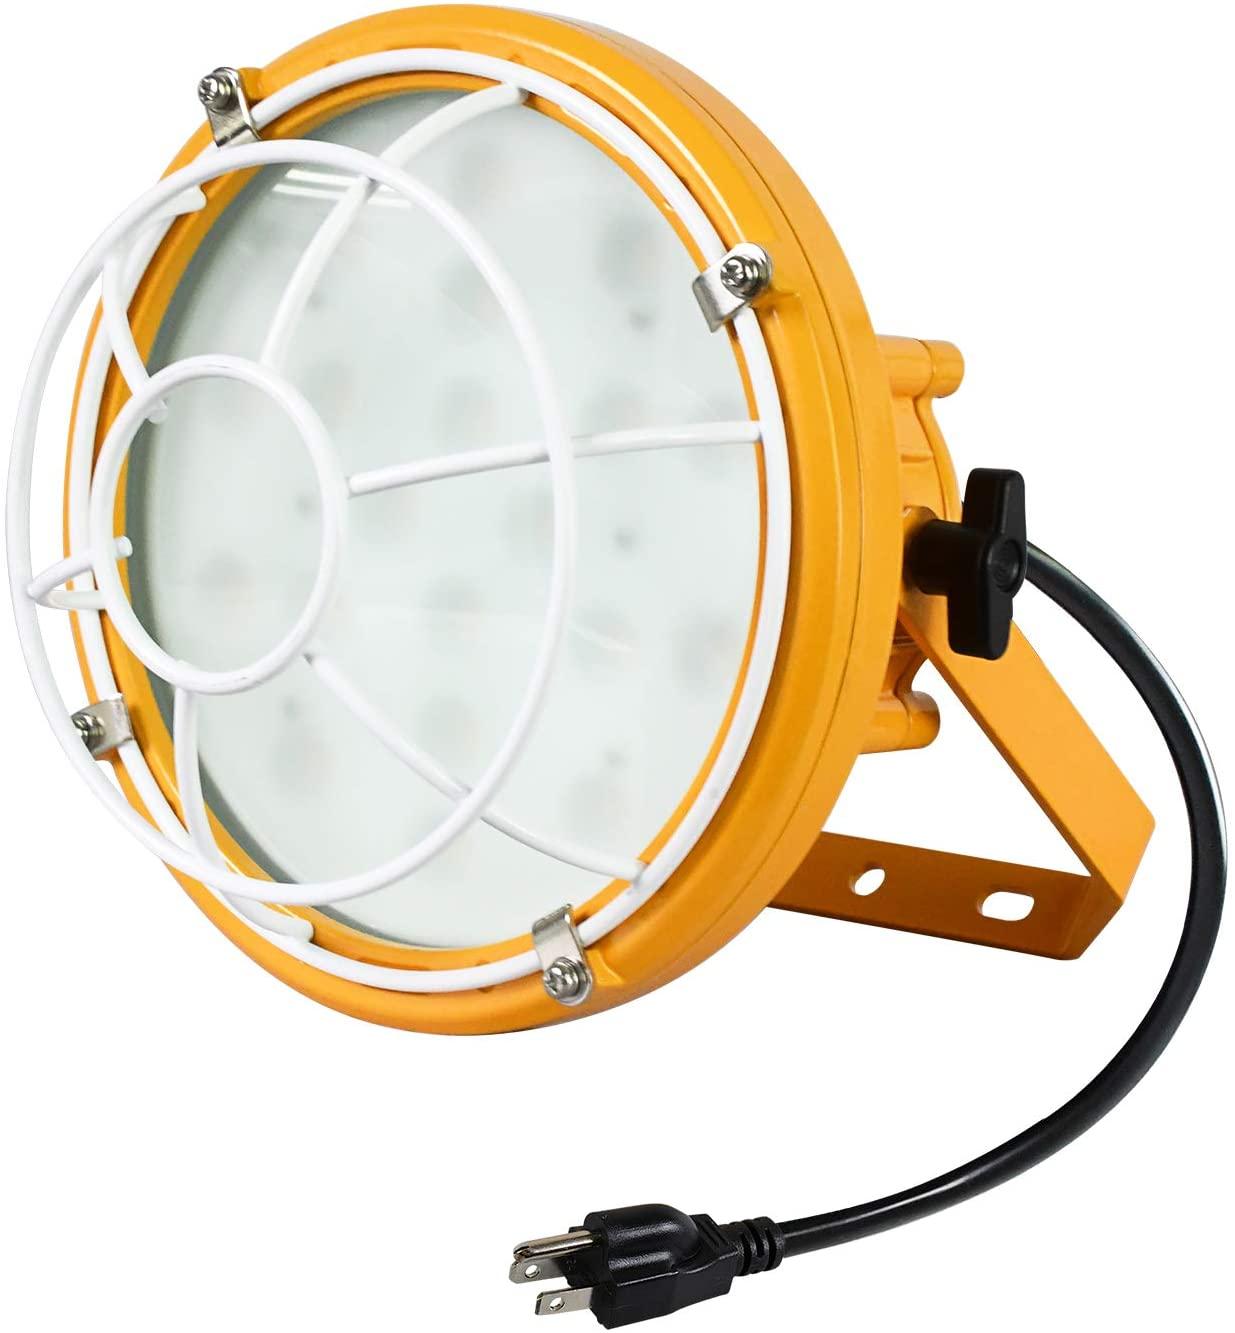 Lawind LED Dock Light 50W Soft Light Head Only, LED Garage Lighting,Shop Lights 5000K Ceiling Light for Workshop Basement, Outdoor, Waterproof Exterior Security Wall Light for Patio, Garden,Yard